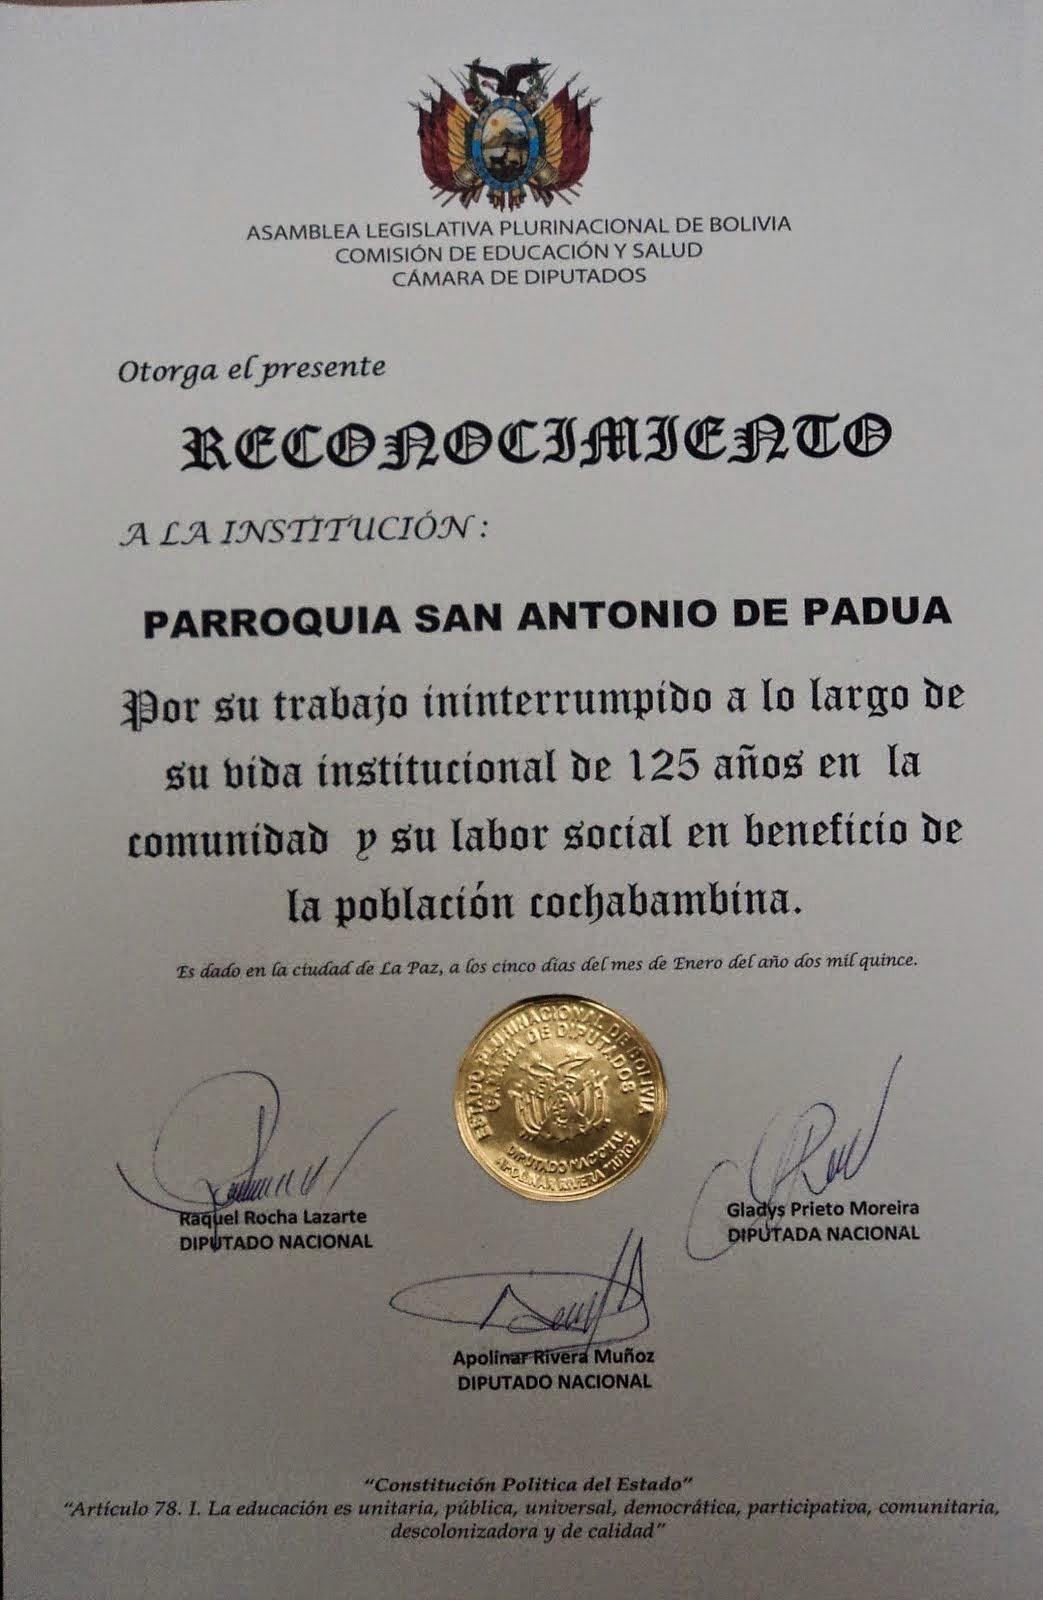 RECONOCIMIENTO CAMARA DE DIPUTADOS